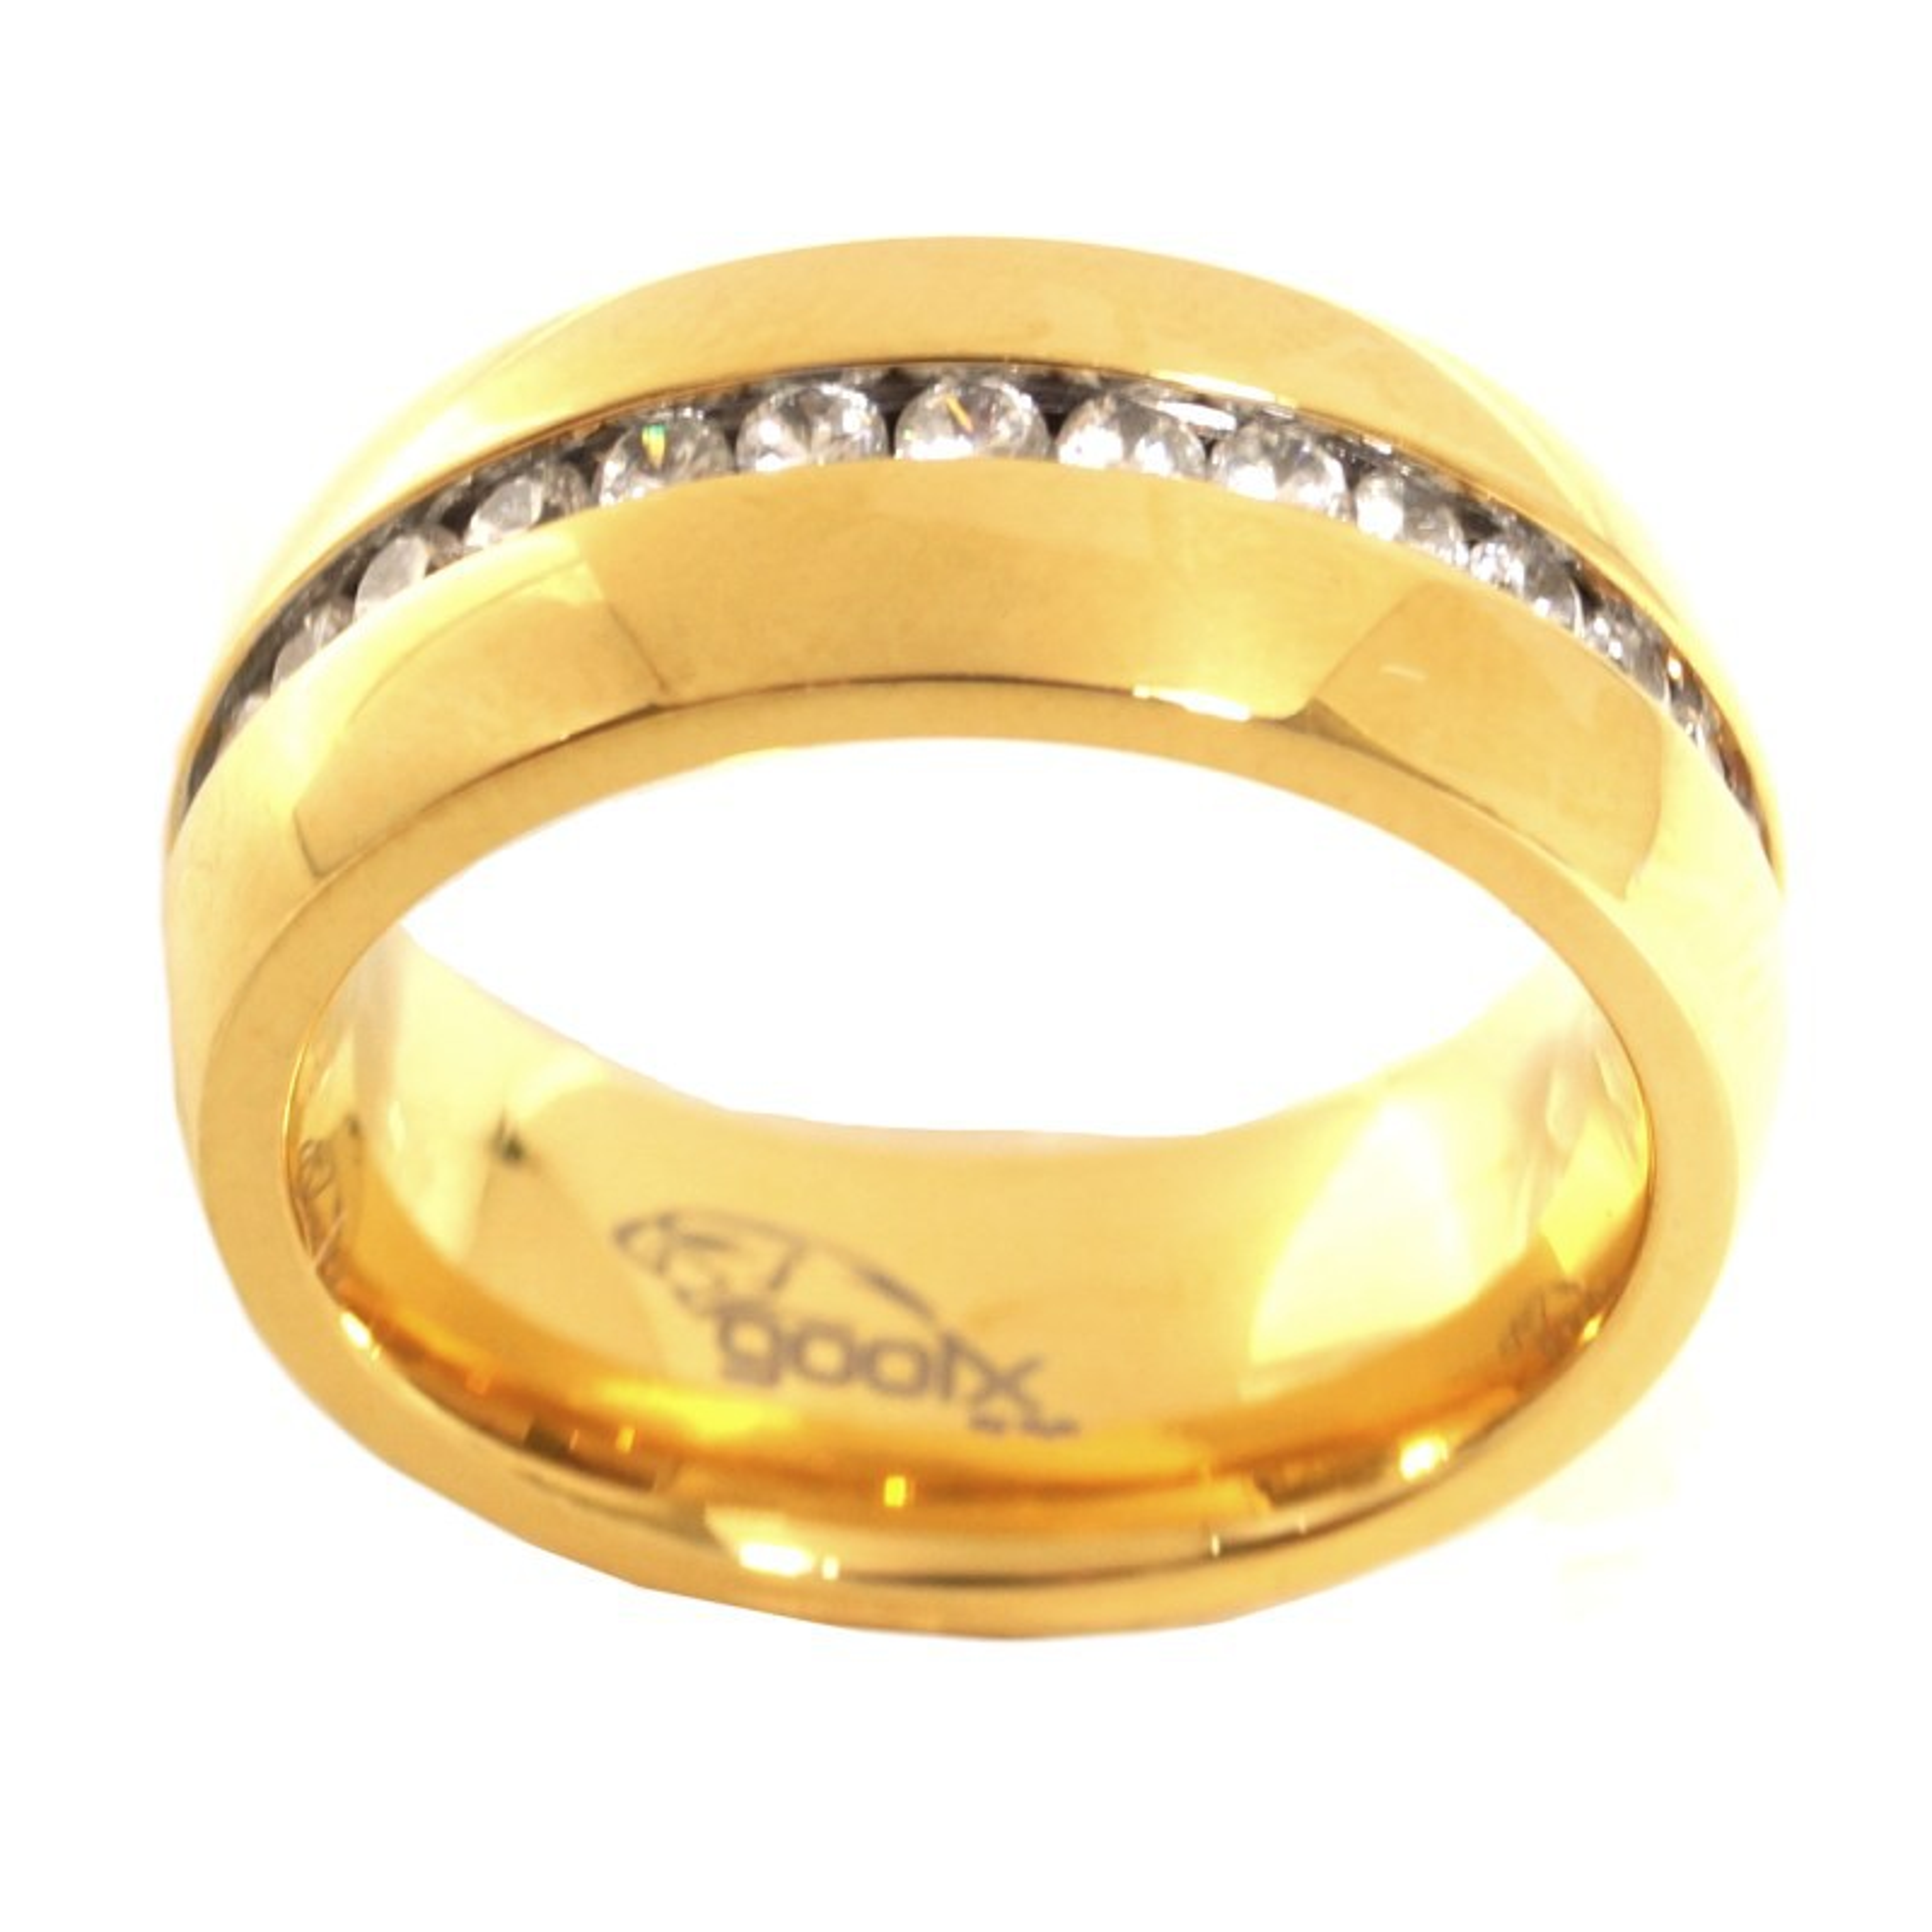 GOOIX 444-2132 Damen Ring Edelstahl gold Zirkonia Weiß 54 (17.2)